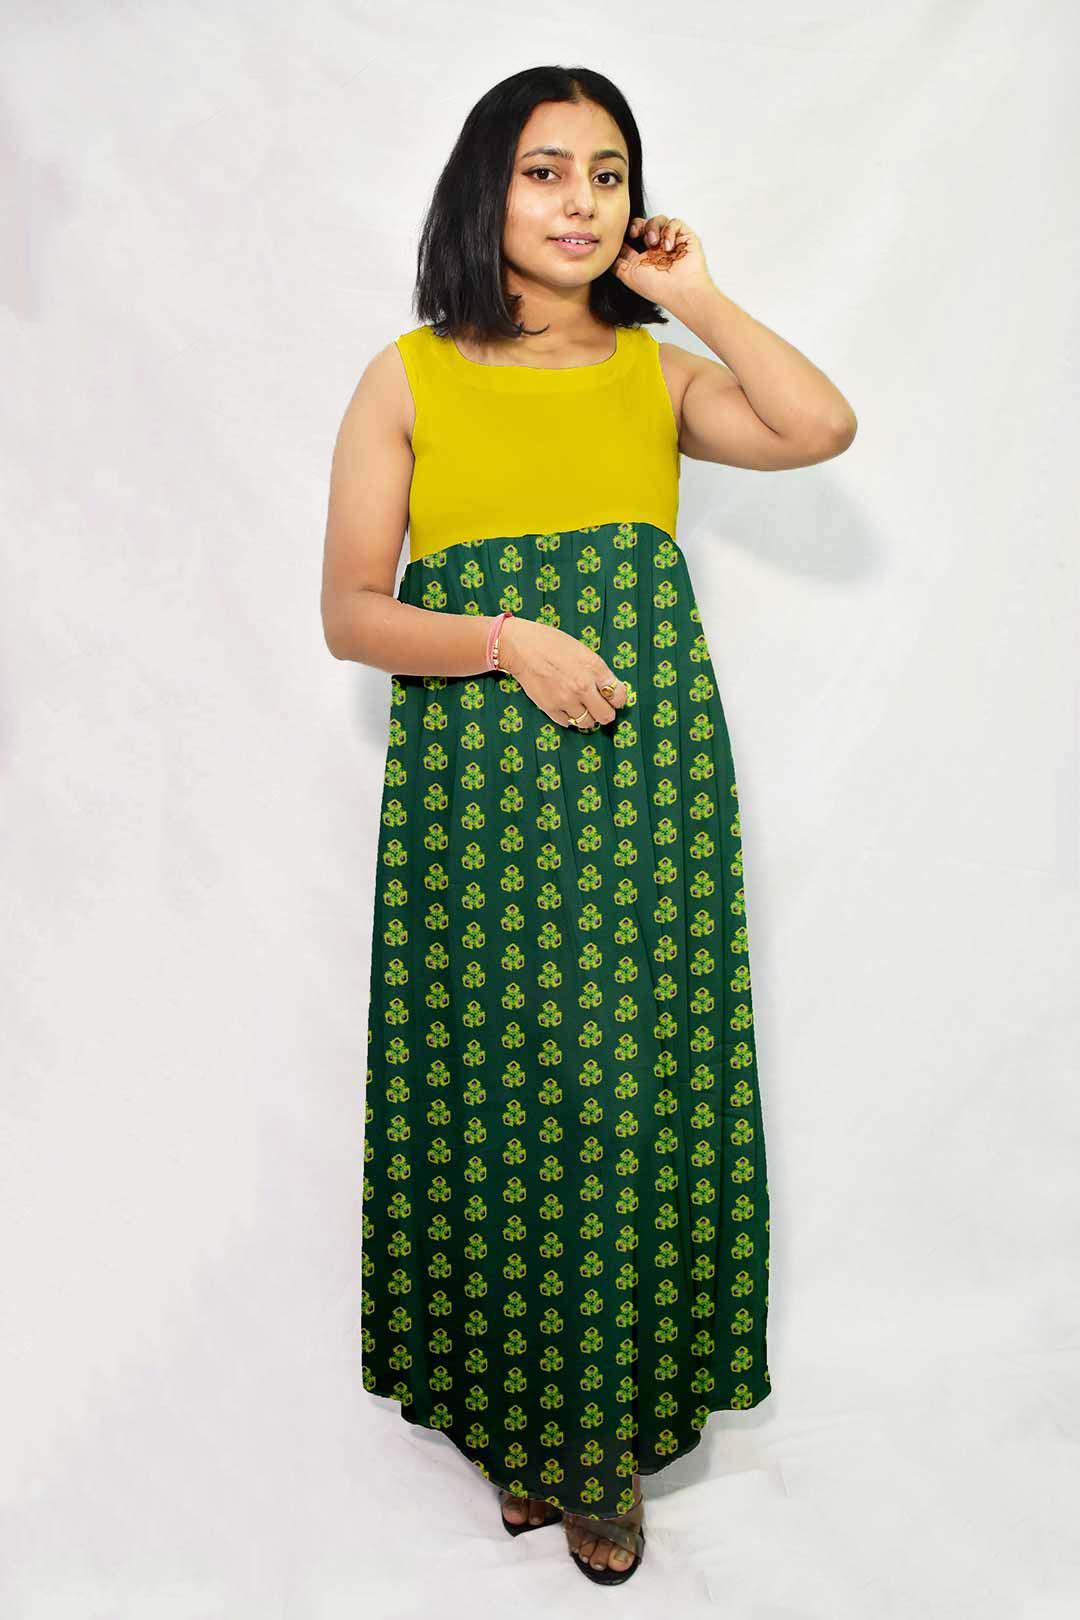 Georgette Maxi Dress – Spinach